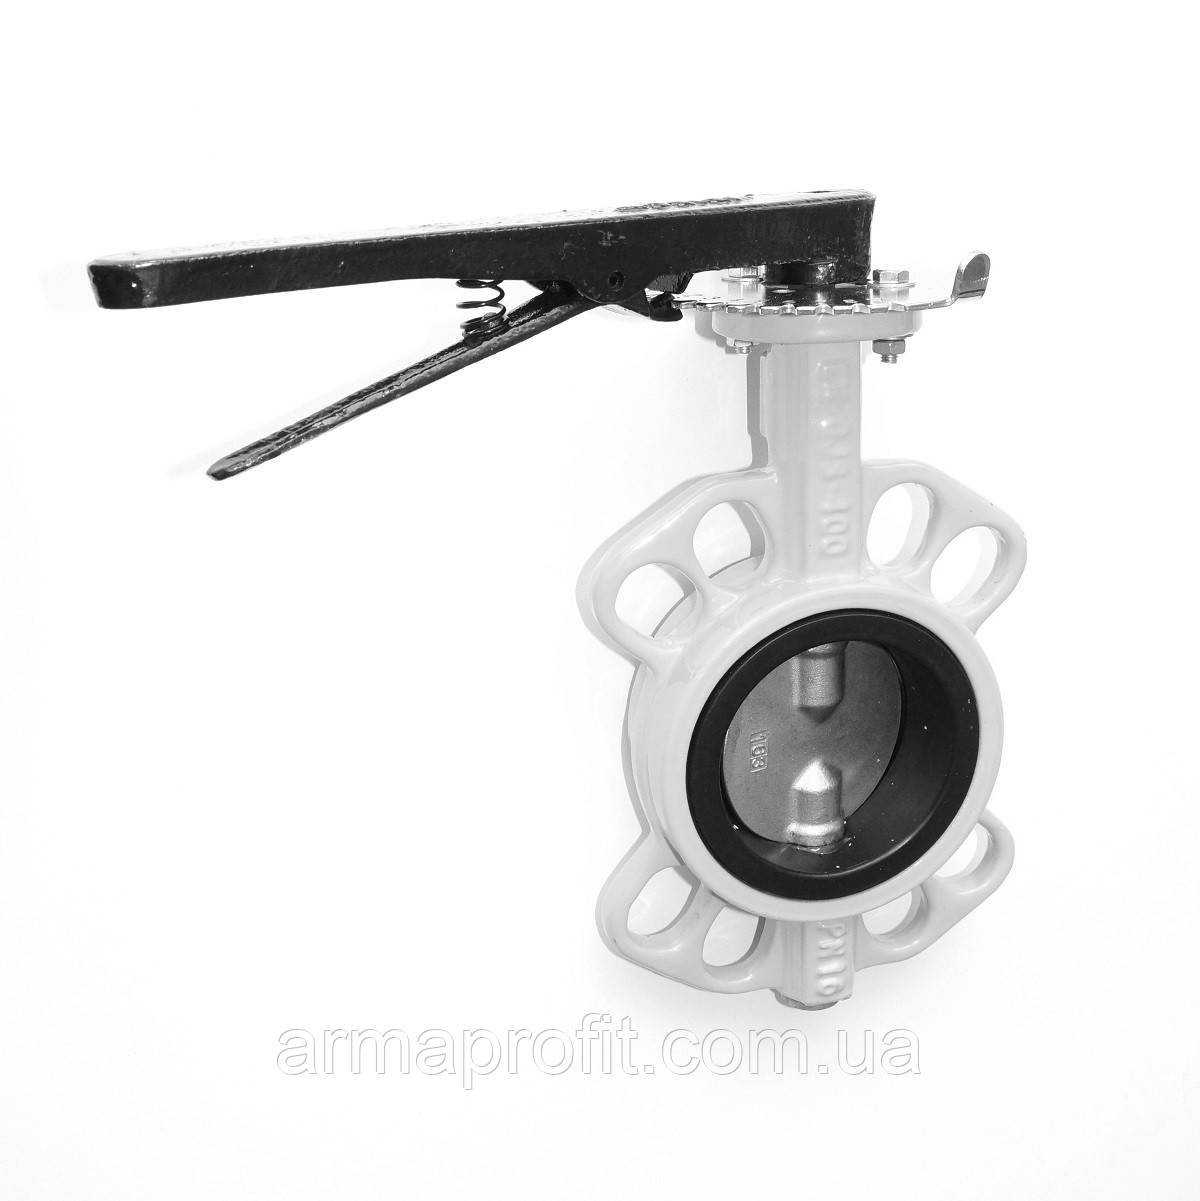 Задвижка поворотная Баттерфляй для газа RBV-16-40(G) (P204) Ду500 Ру16 с редуктором